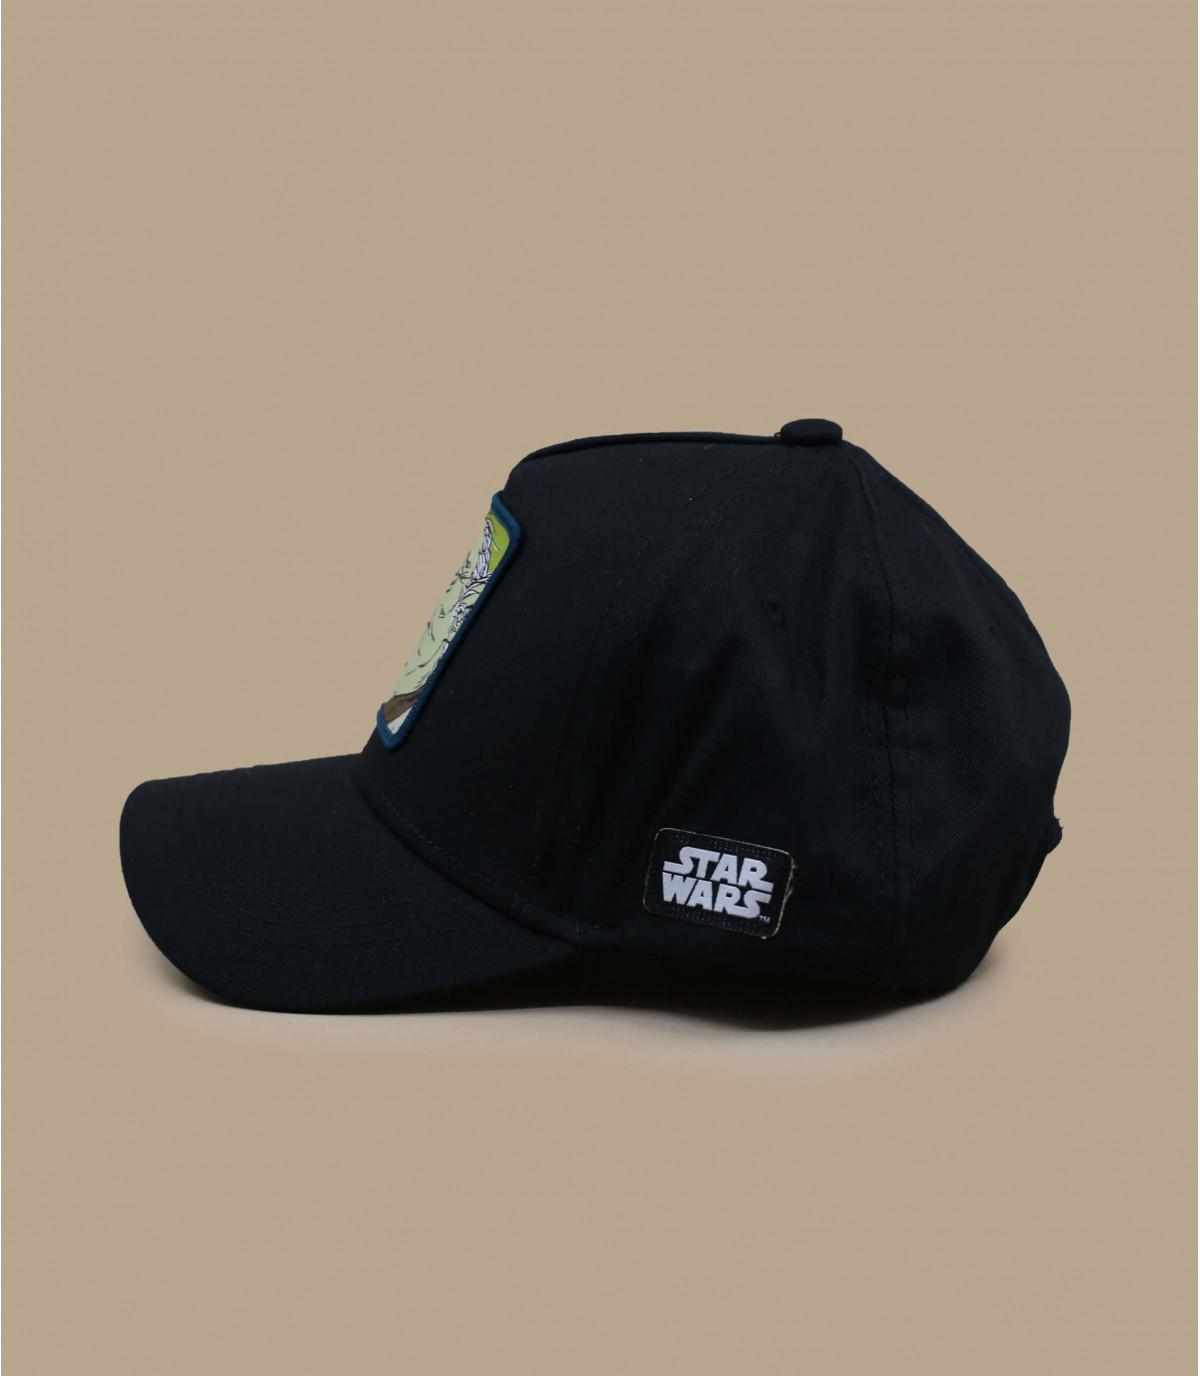 zwarte Yoda trucker